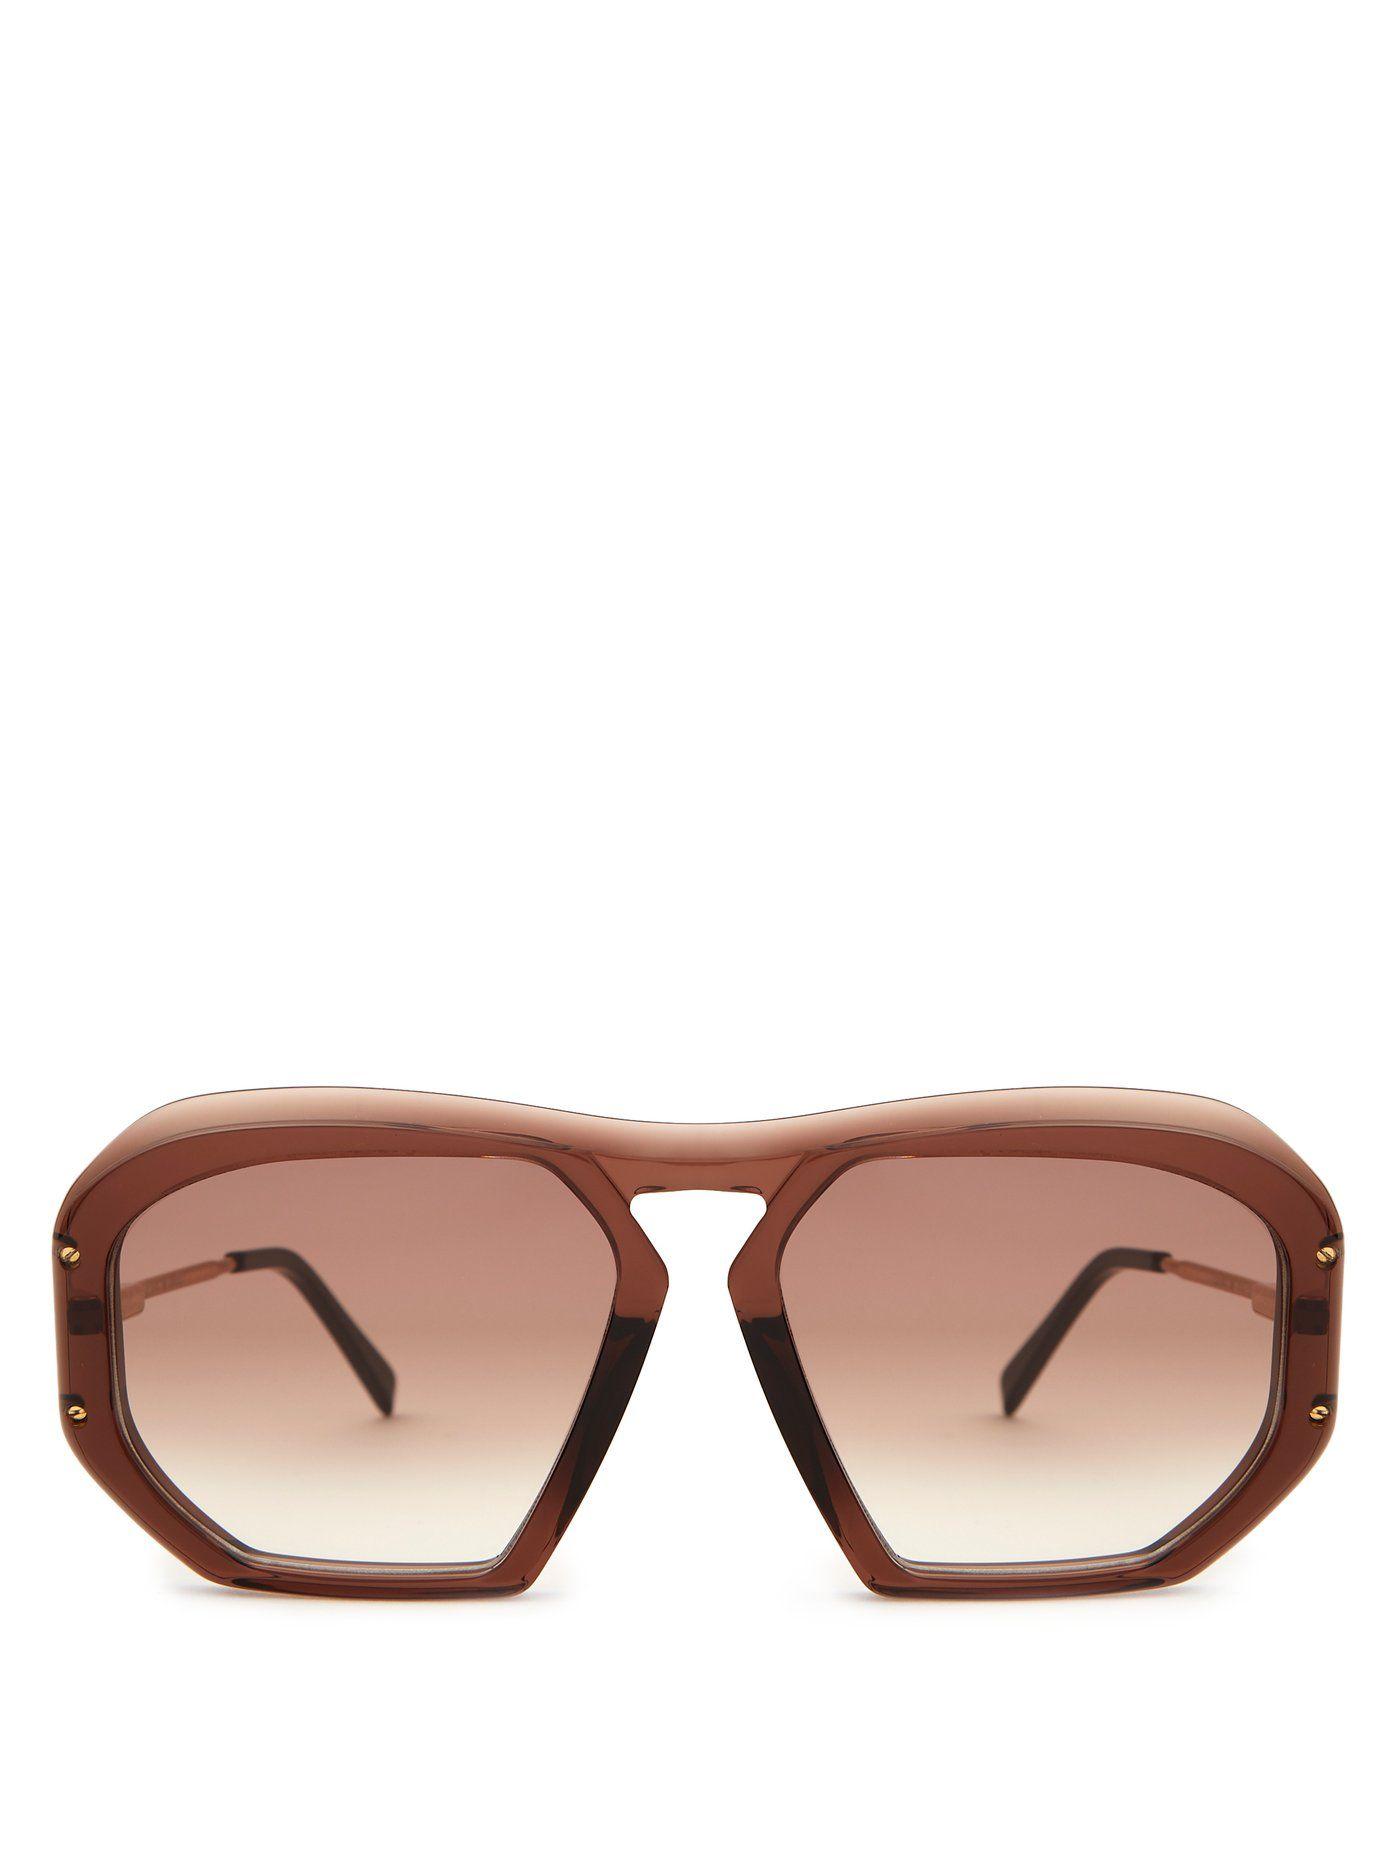 CÉLINE EYEWEARSquare-frame acetate sunglasses的圖片搜尋結果